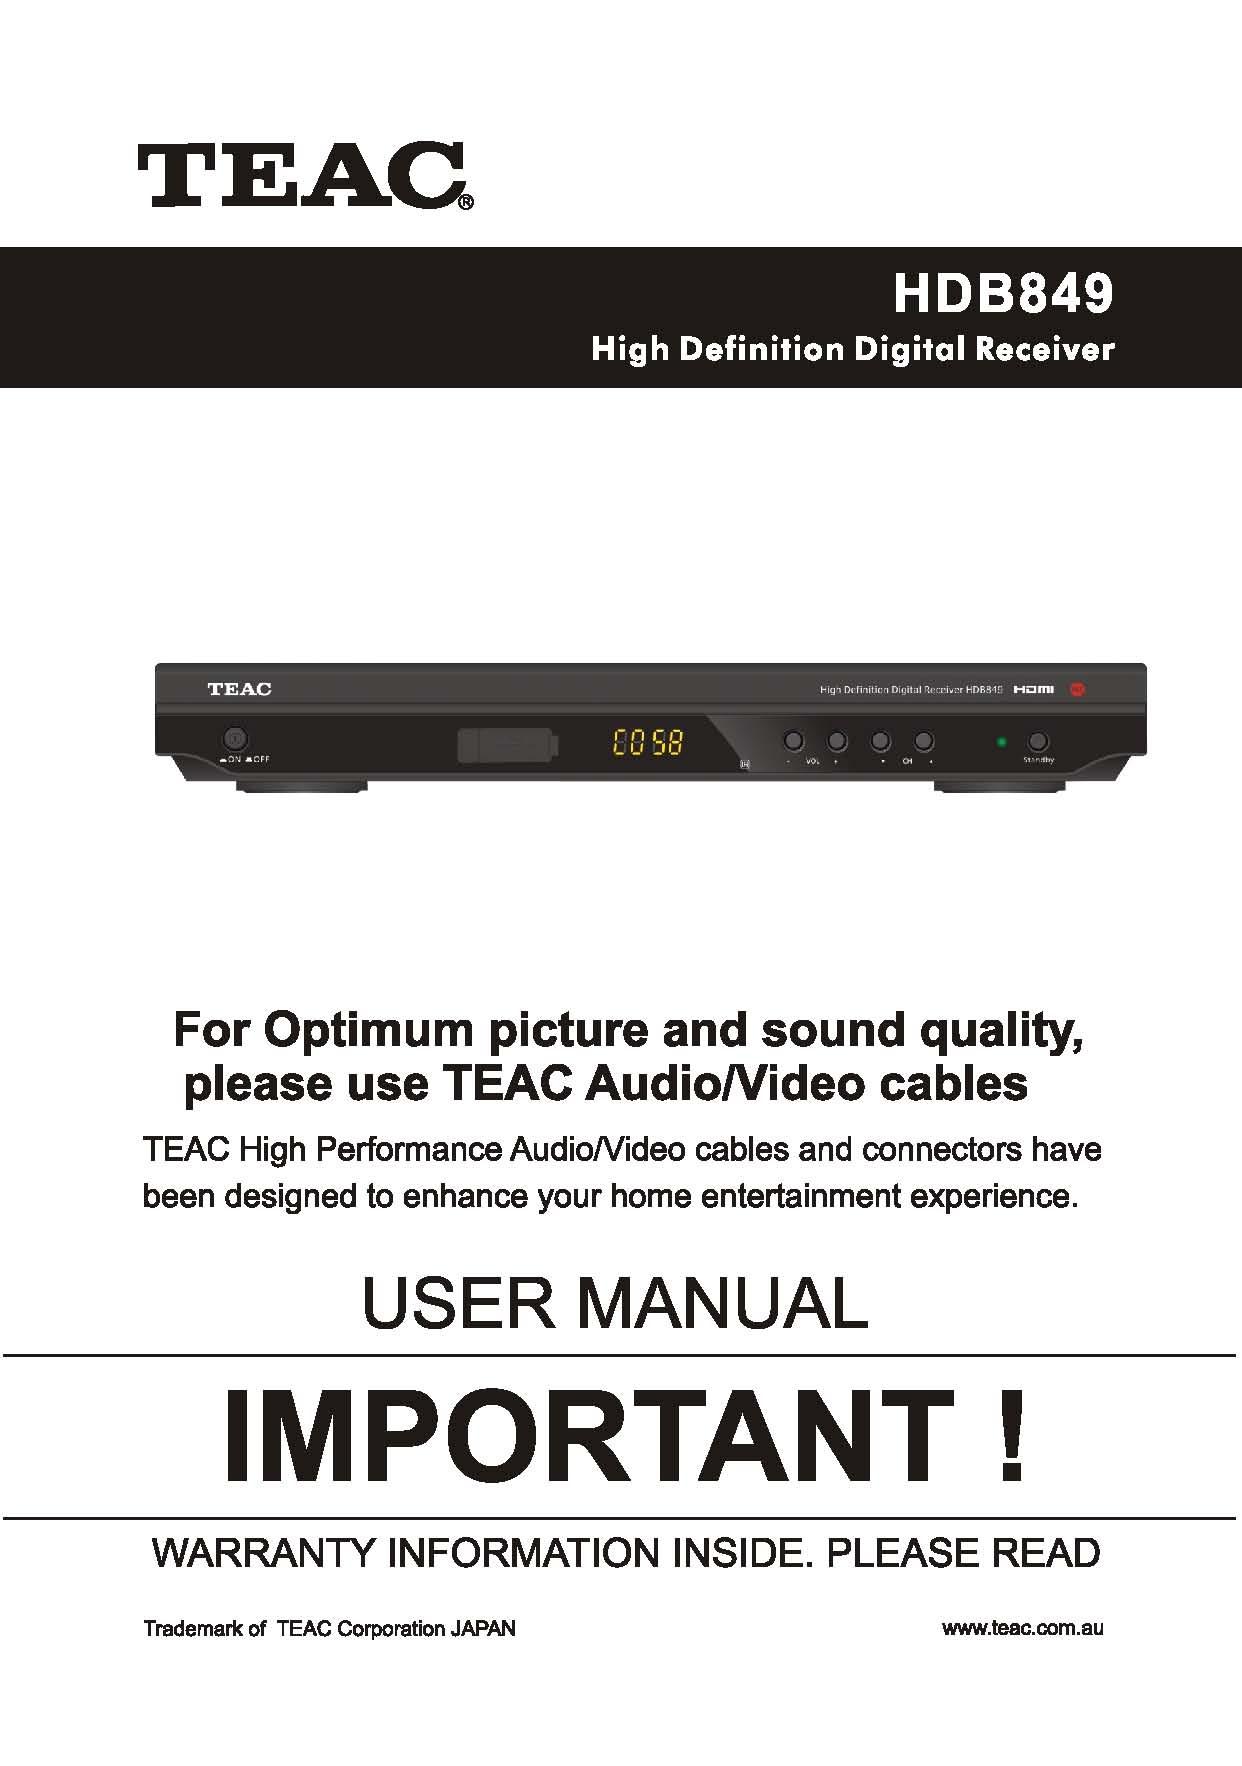 teac hdb849 user manual store809 rh store809 com TEAC CD Recorder Manual TEAC 3340 Service Manual